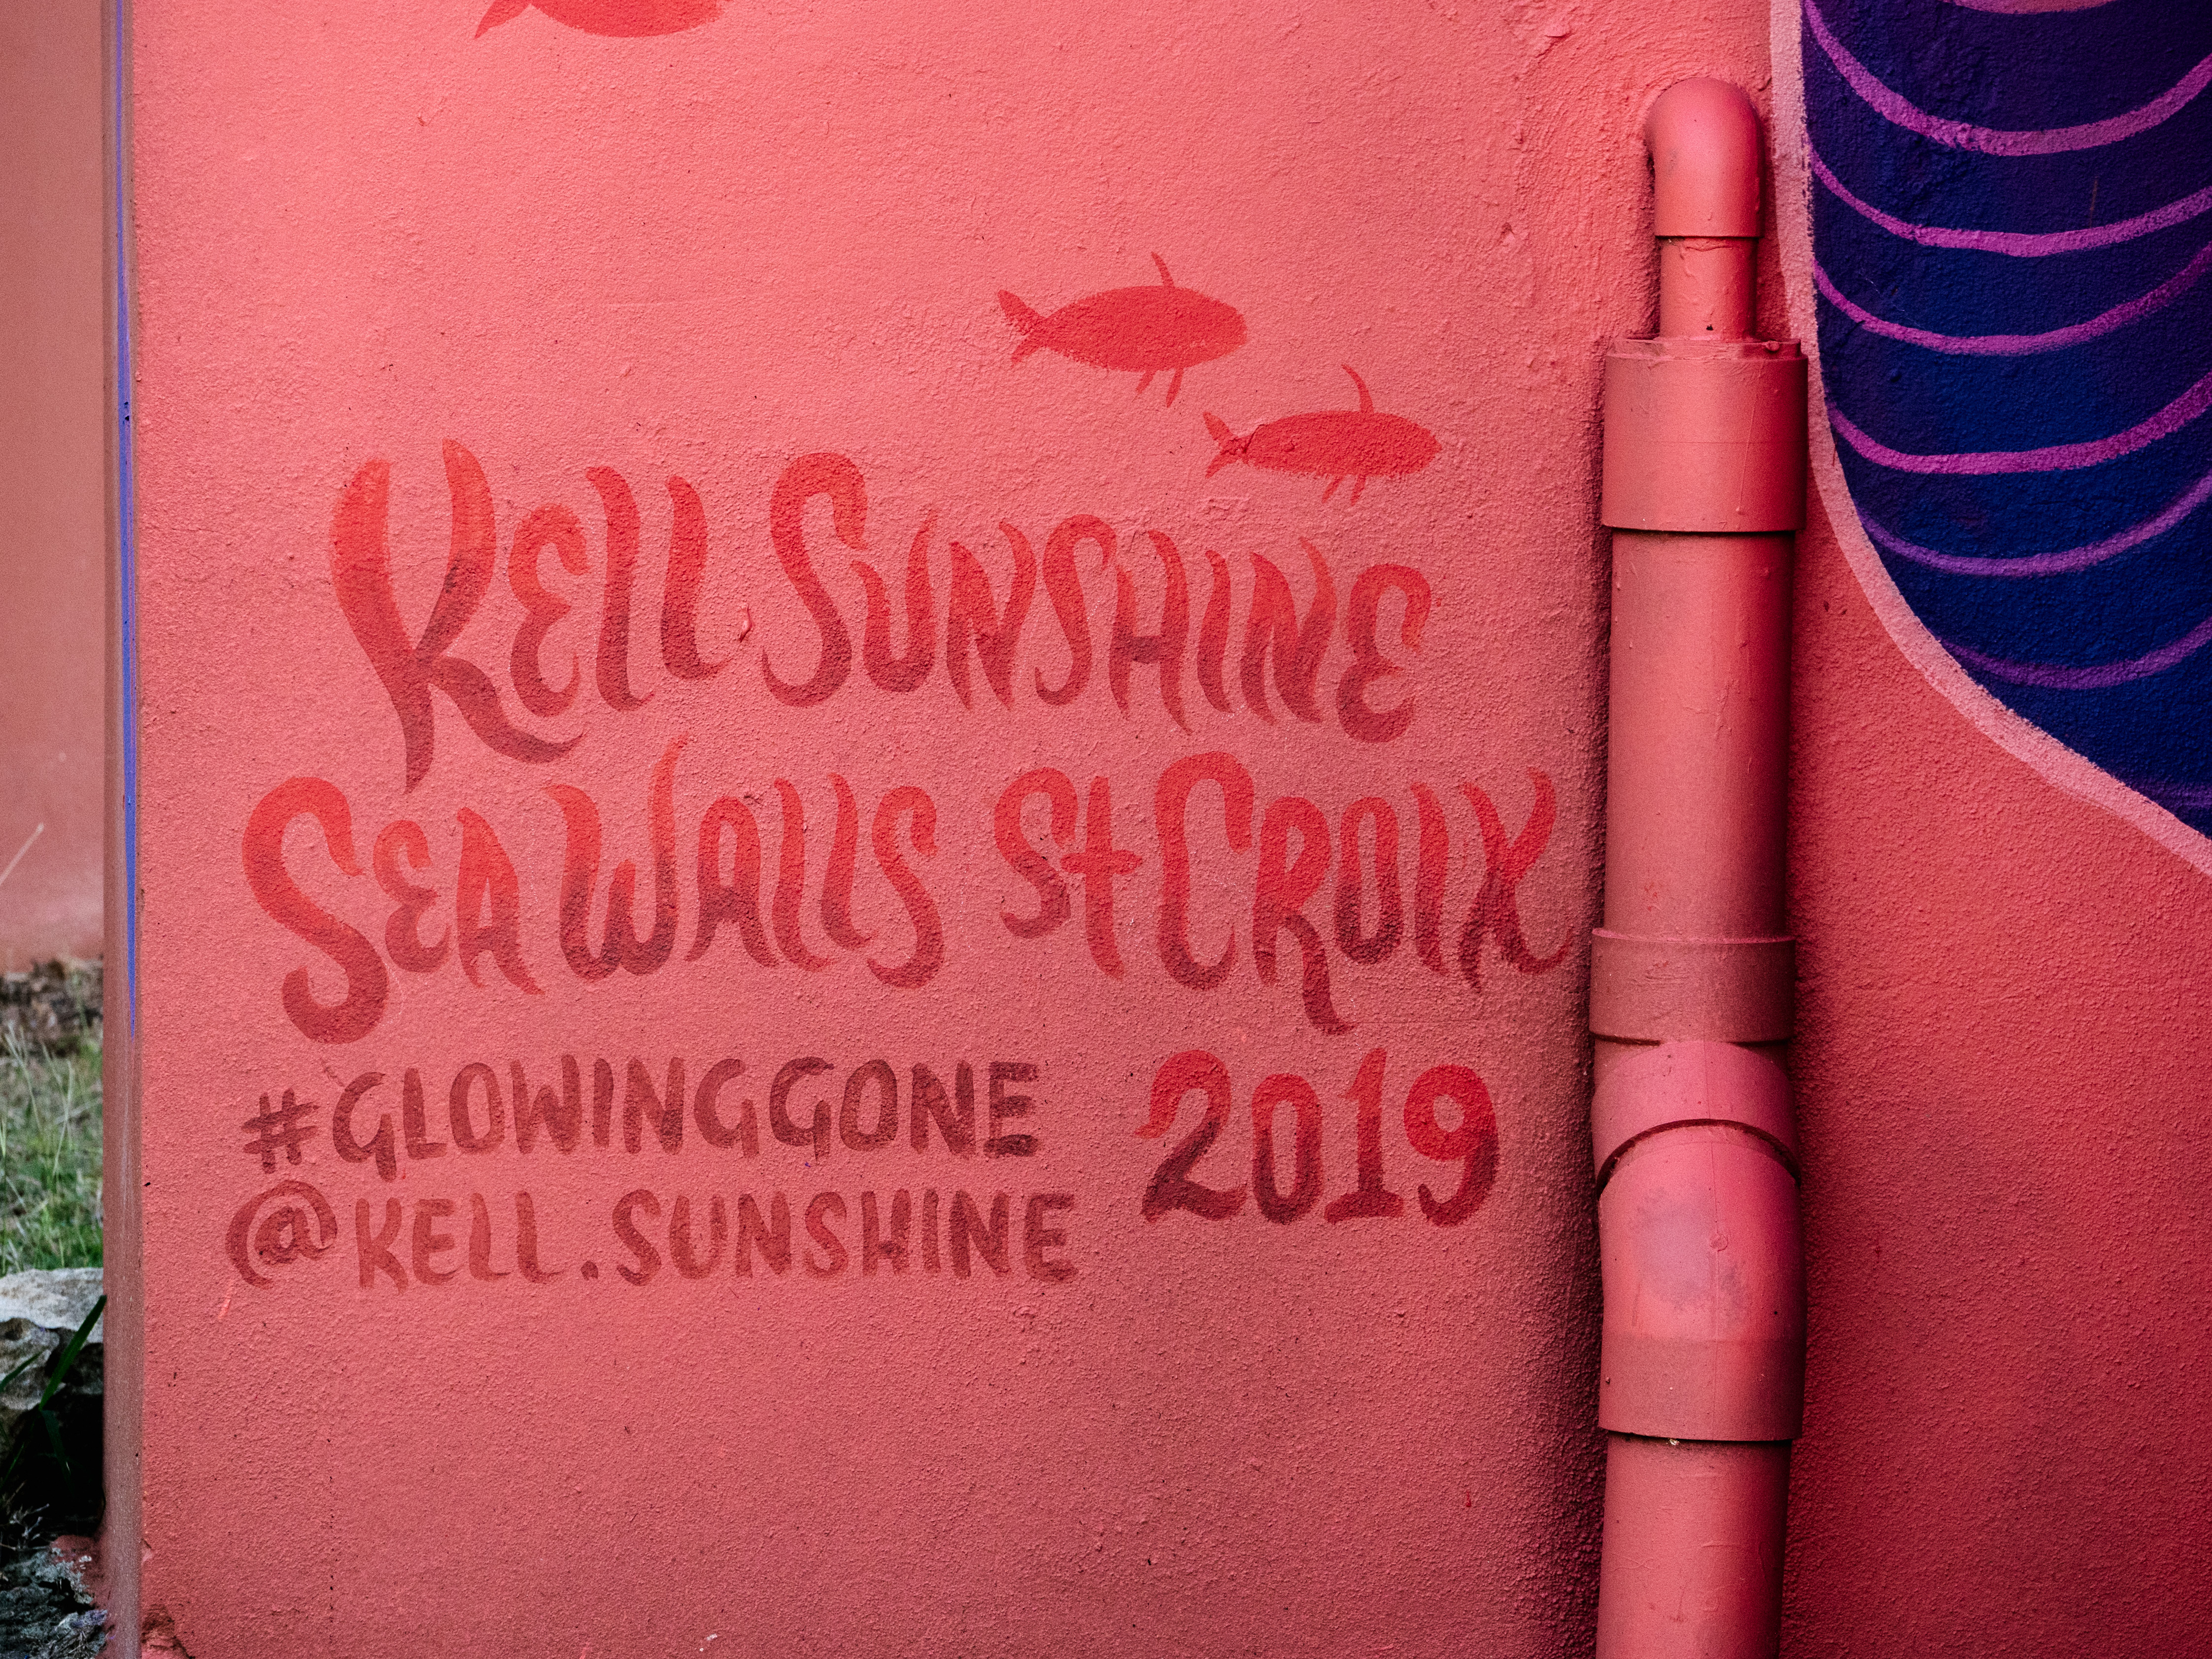 Kell Sunshine